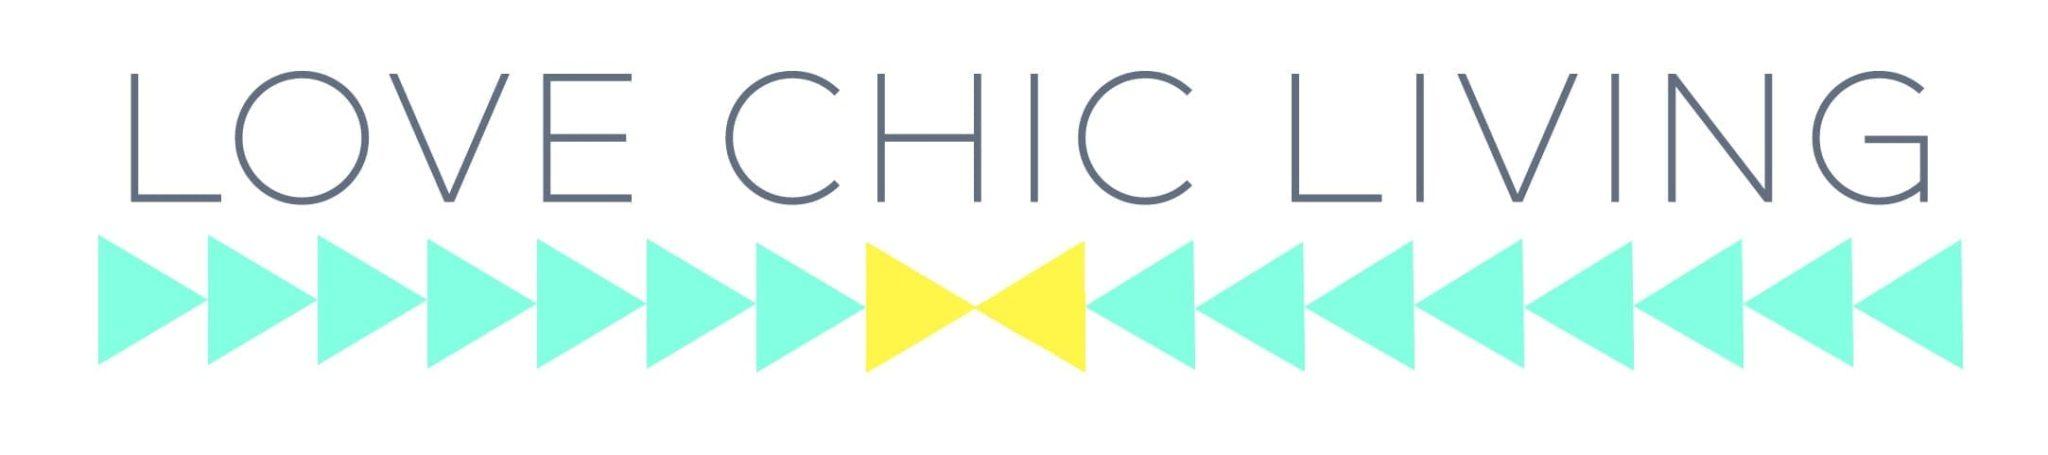 logo-3-yellow-bowtie